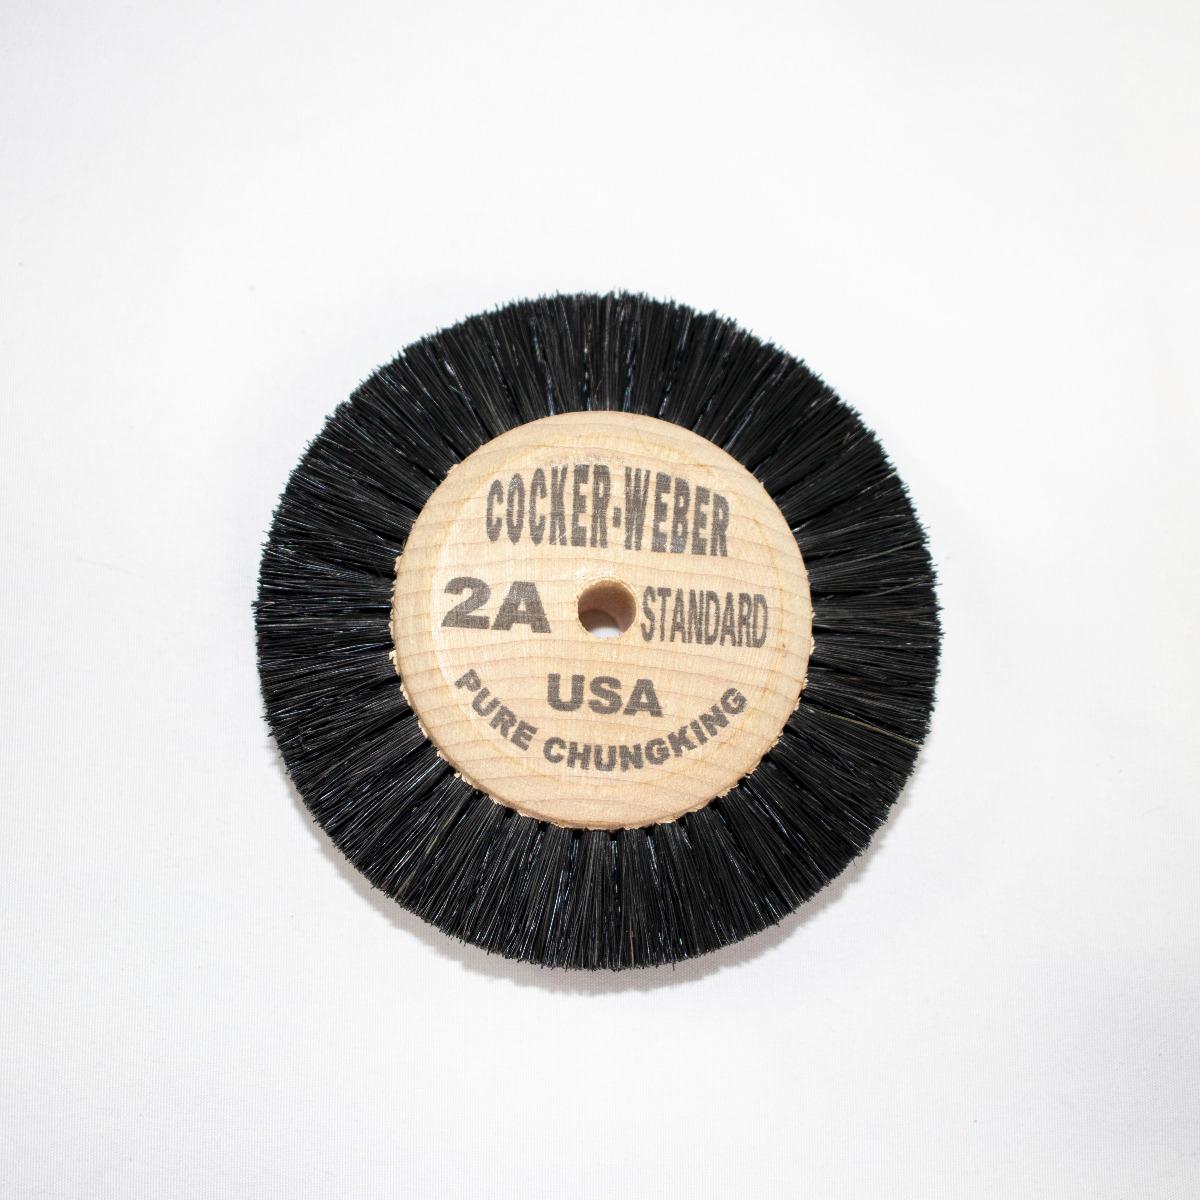 "2-A Green Label Cocker Weber Brush, 5/8"" Trim Hair"